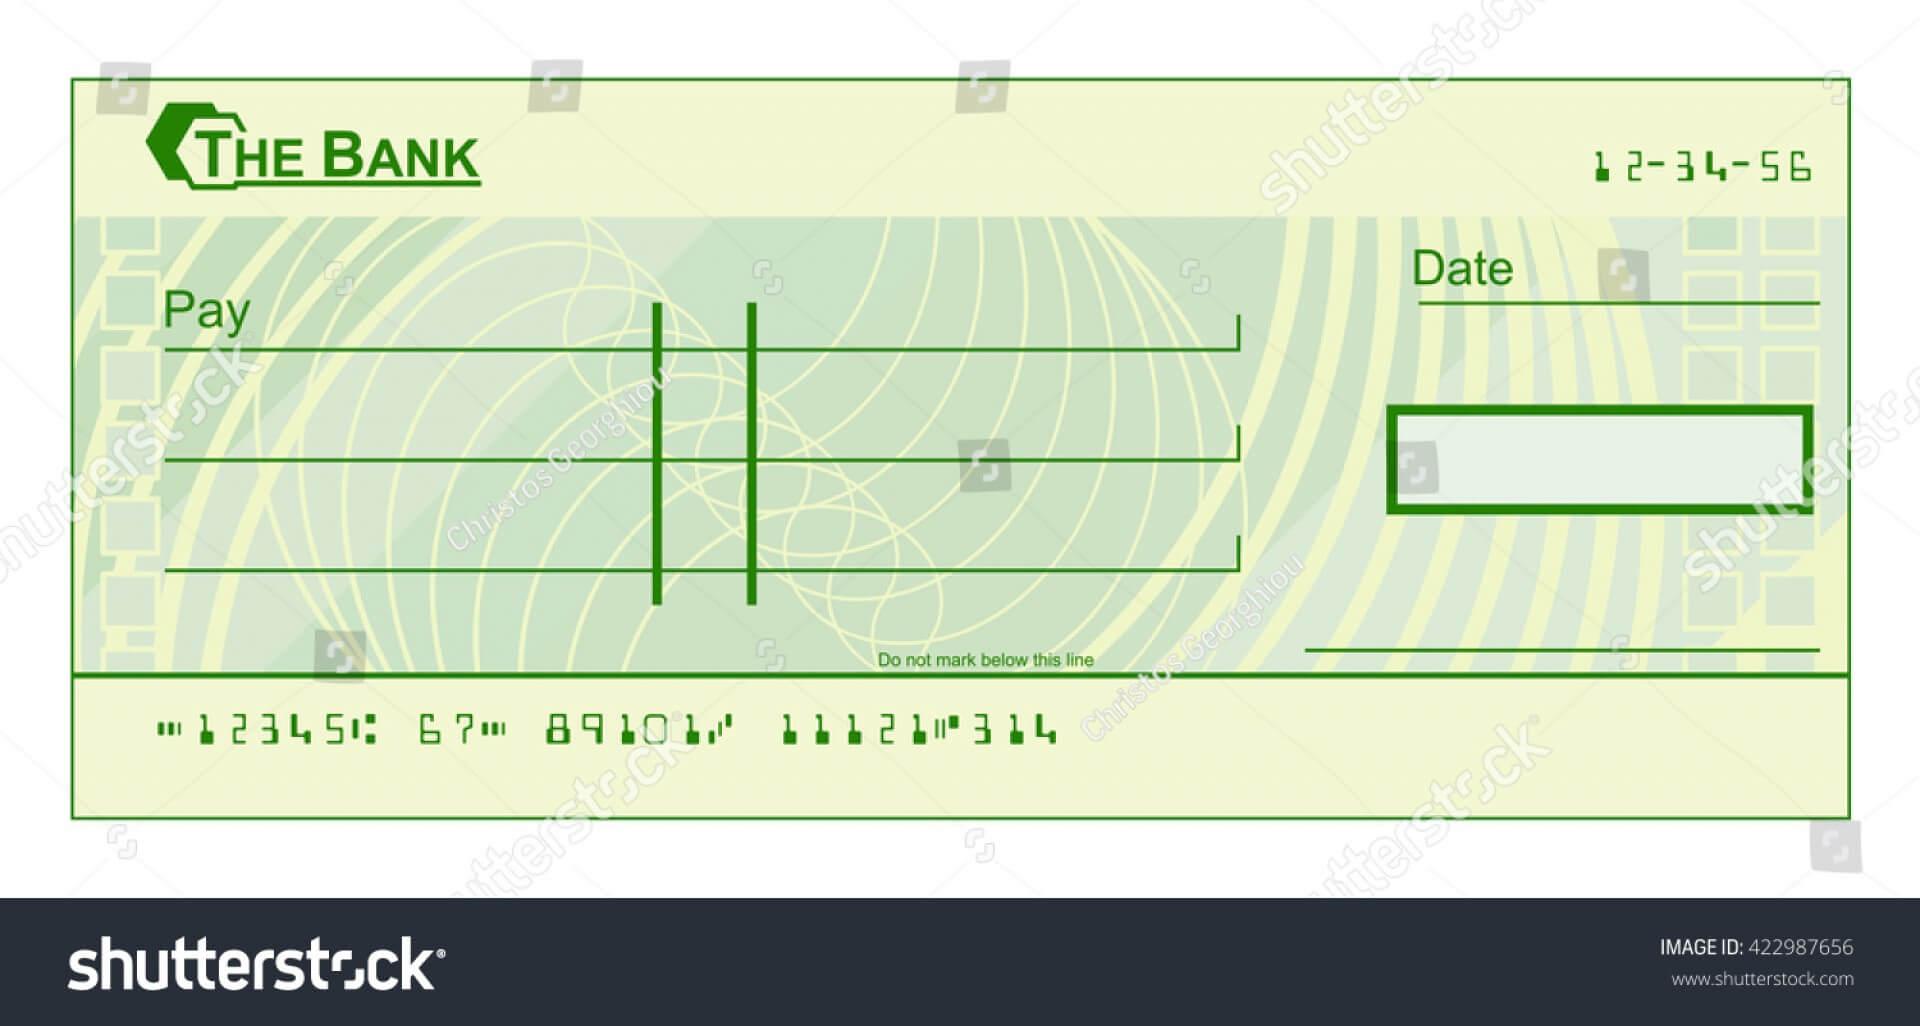 004 Bl Template Ideas Blank Check Stunning Pdf Paycheck Stub regarding Blank Cheque Template Download Free